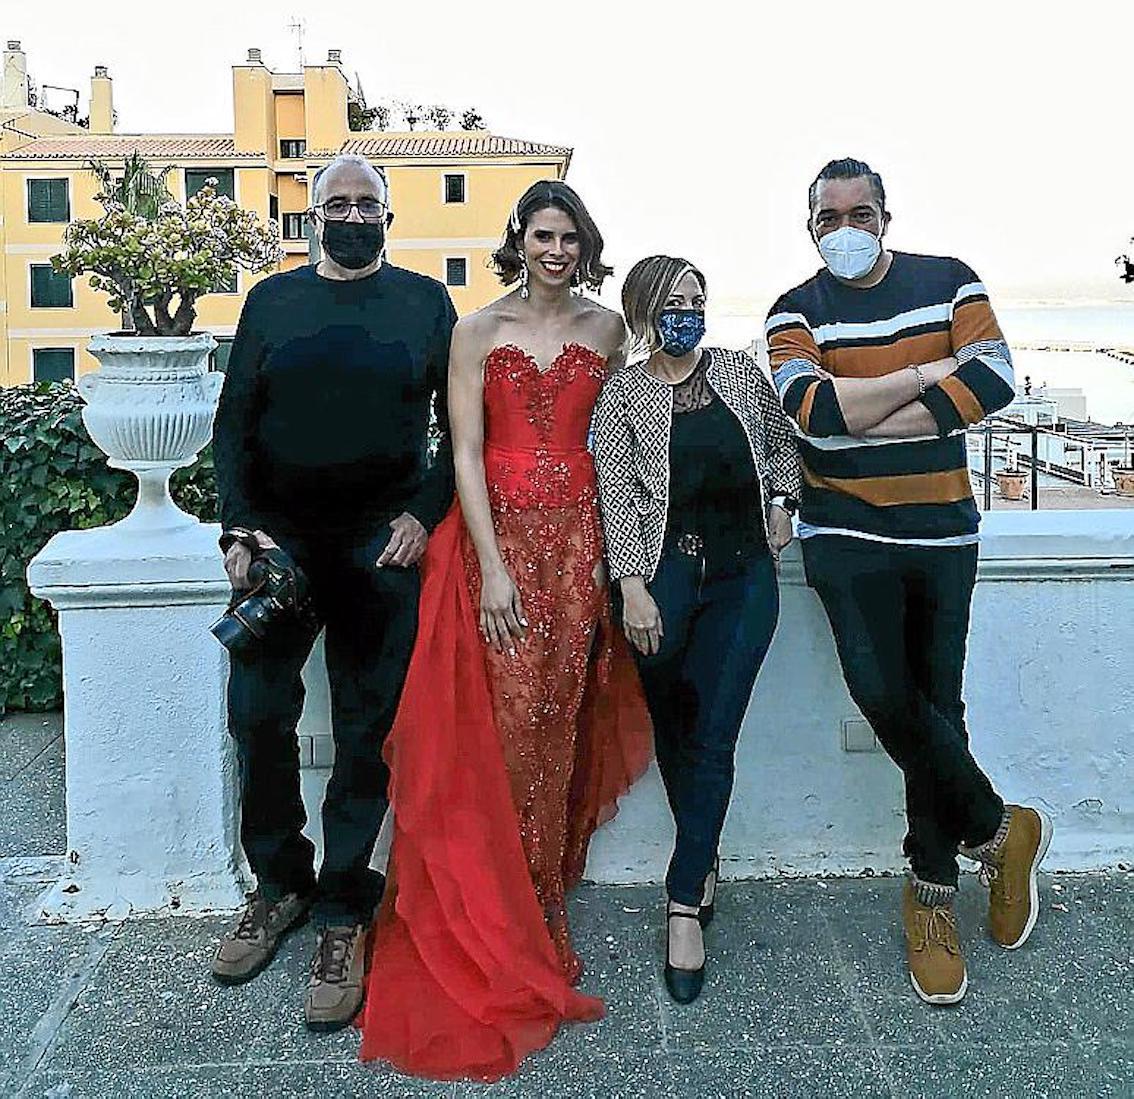 Left-right, Pau Torrens, Mireia Mendoza, Nancy Pujol and Hugo Micaelo, at the Horizonte Hotel.